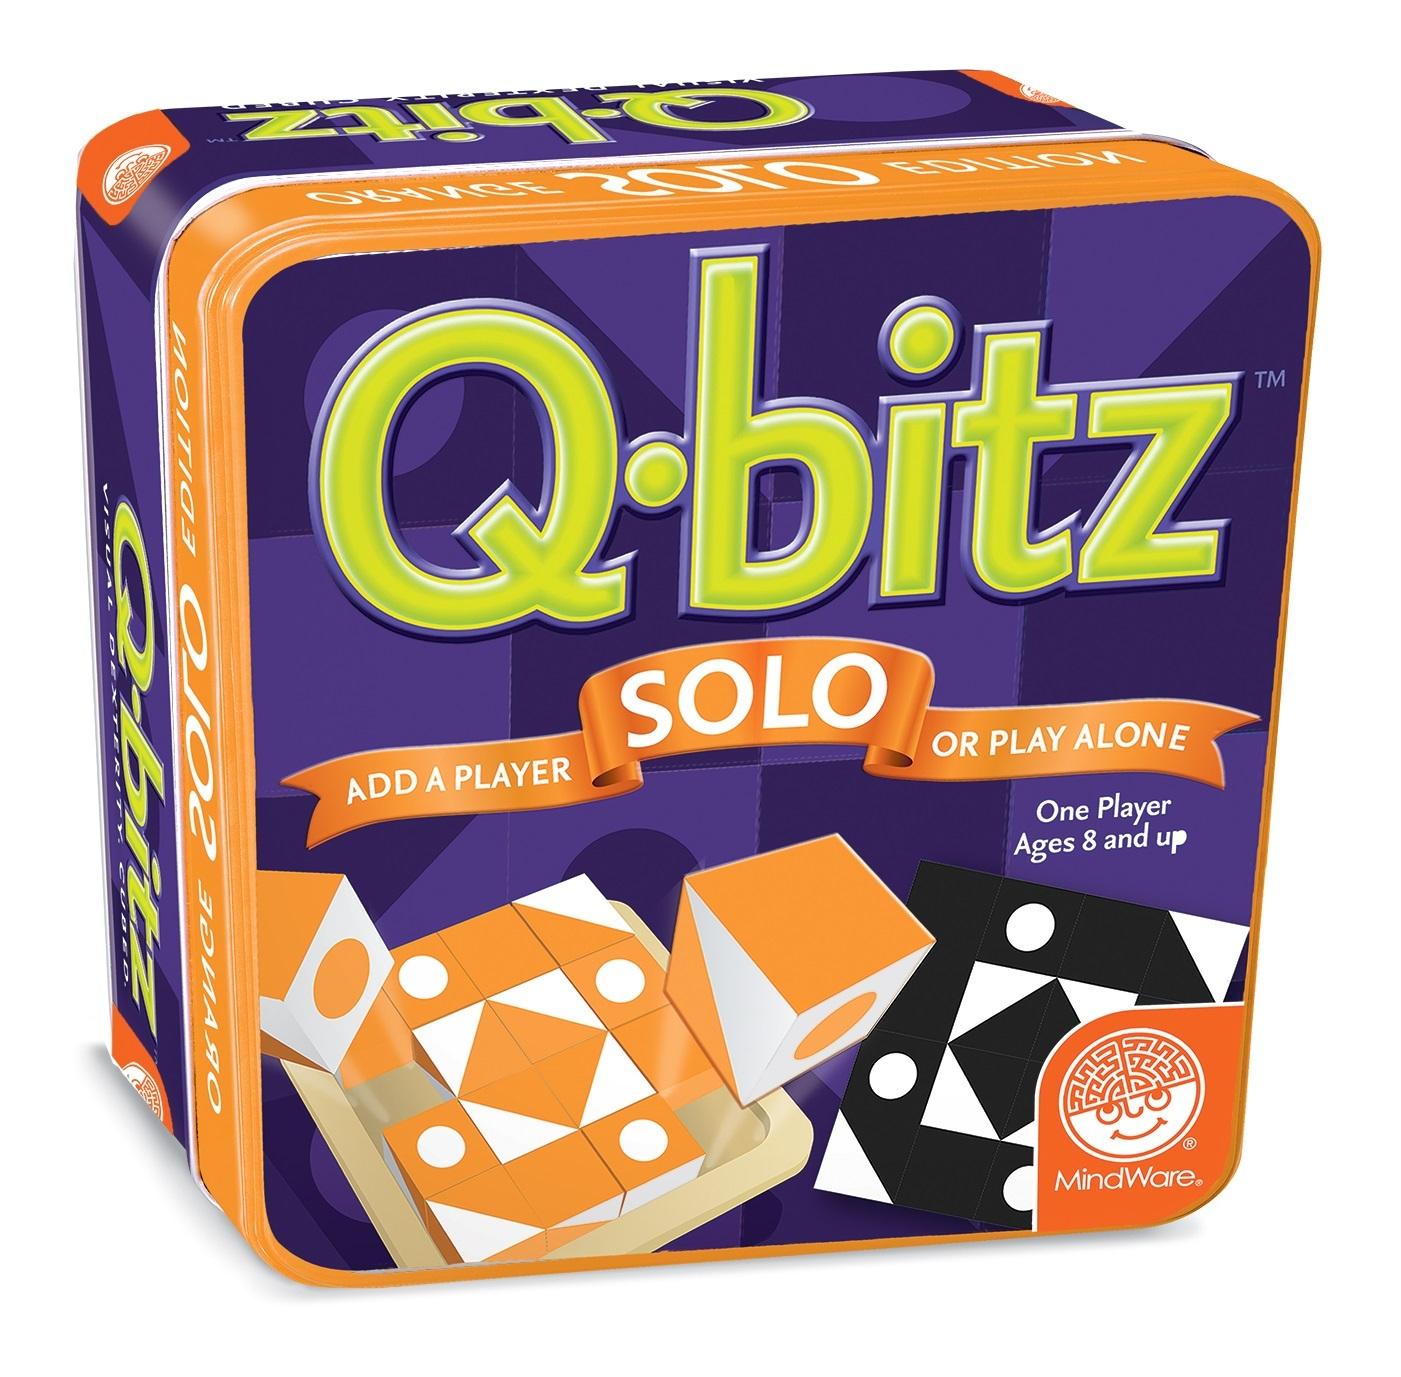 Q-bitz solo (tin)